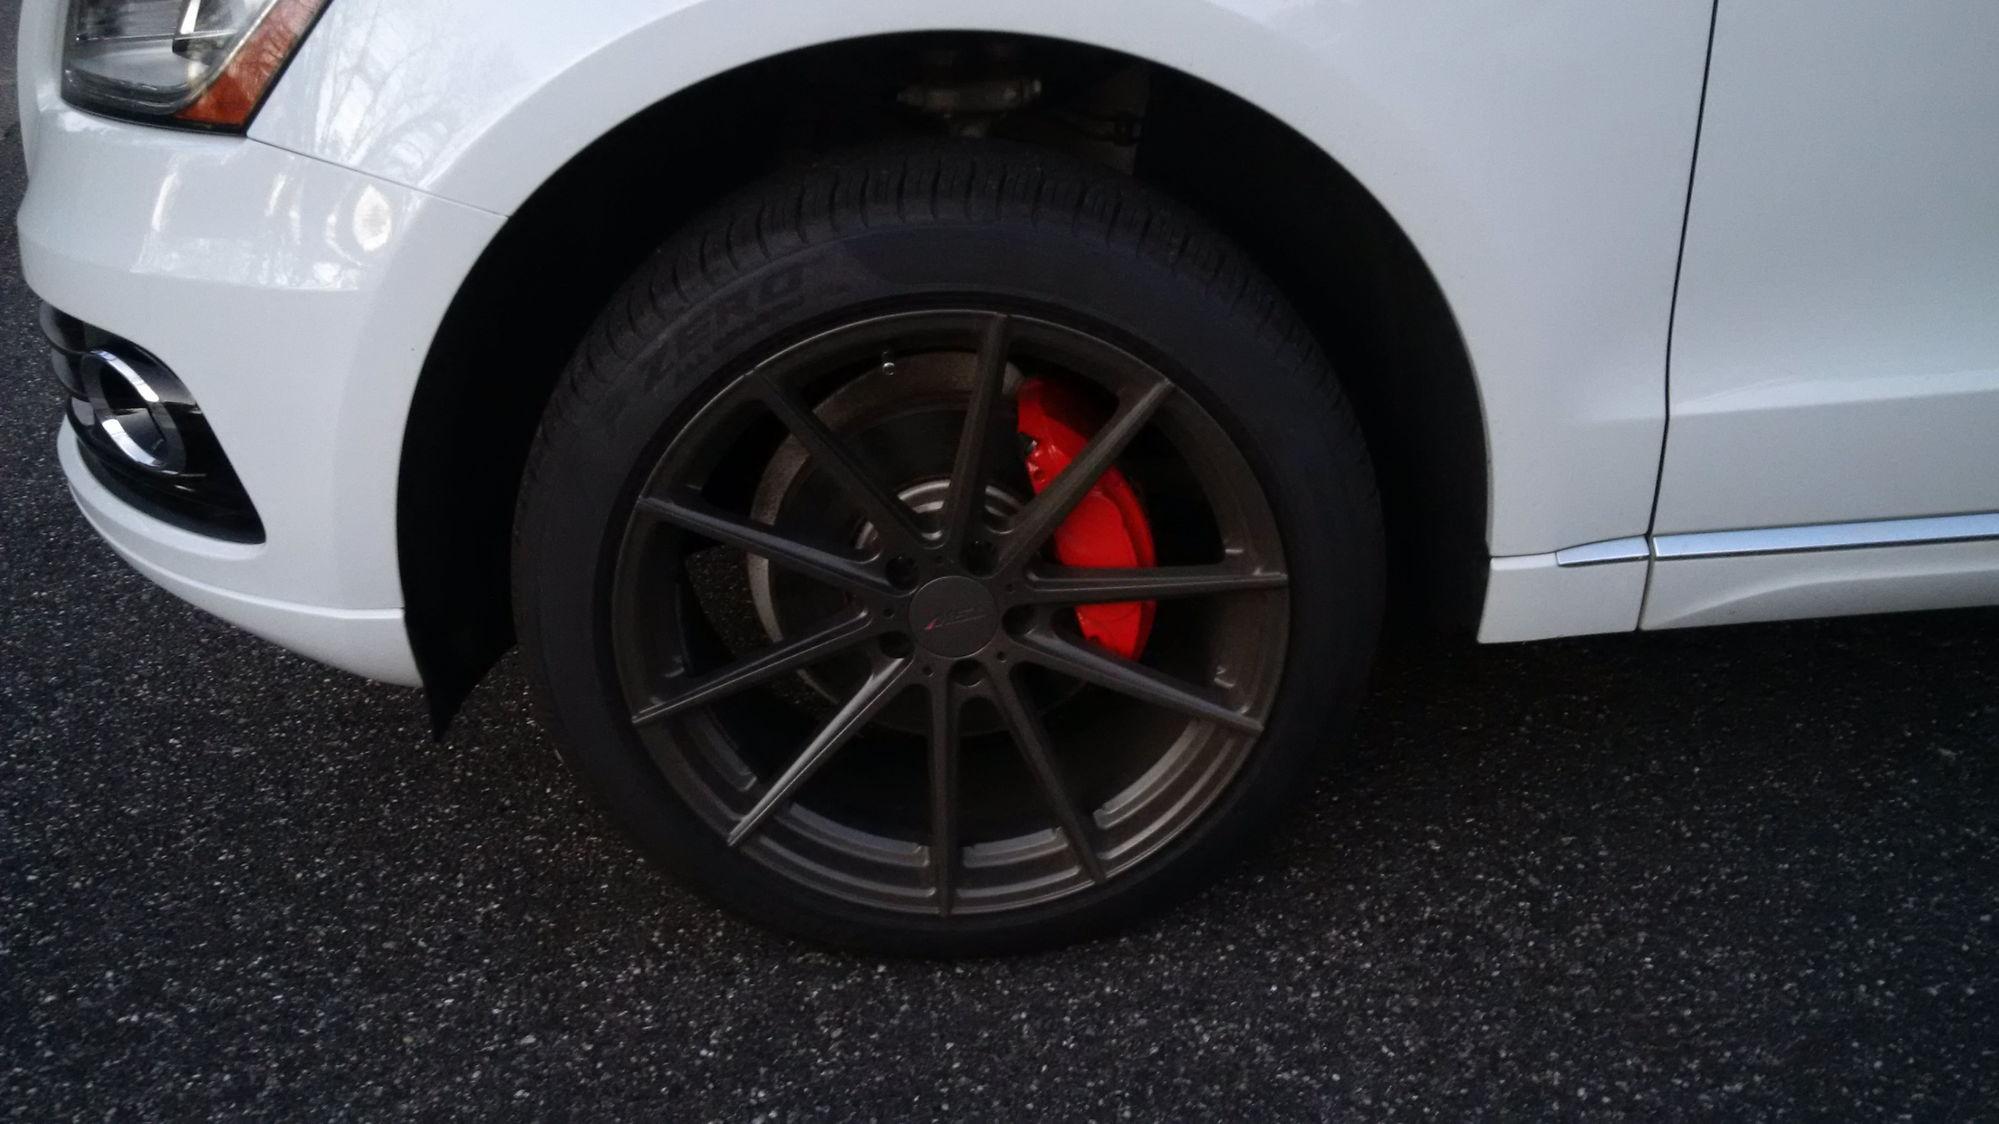 Painting Brake Caliper Need Color Suggestion For Daytona